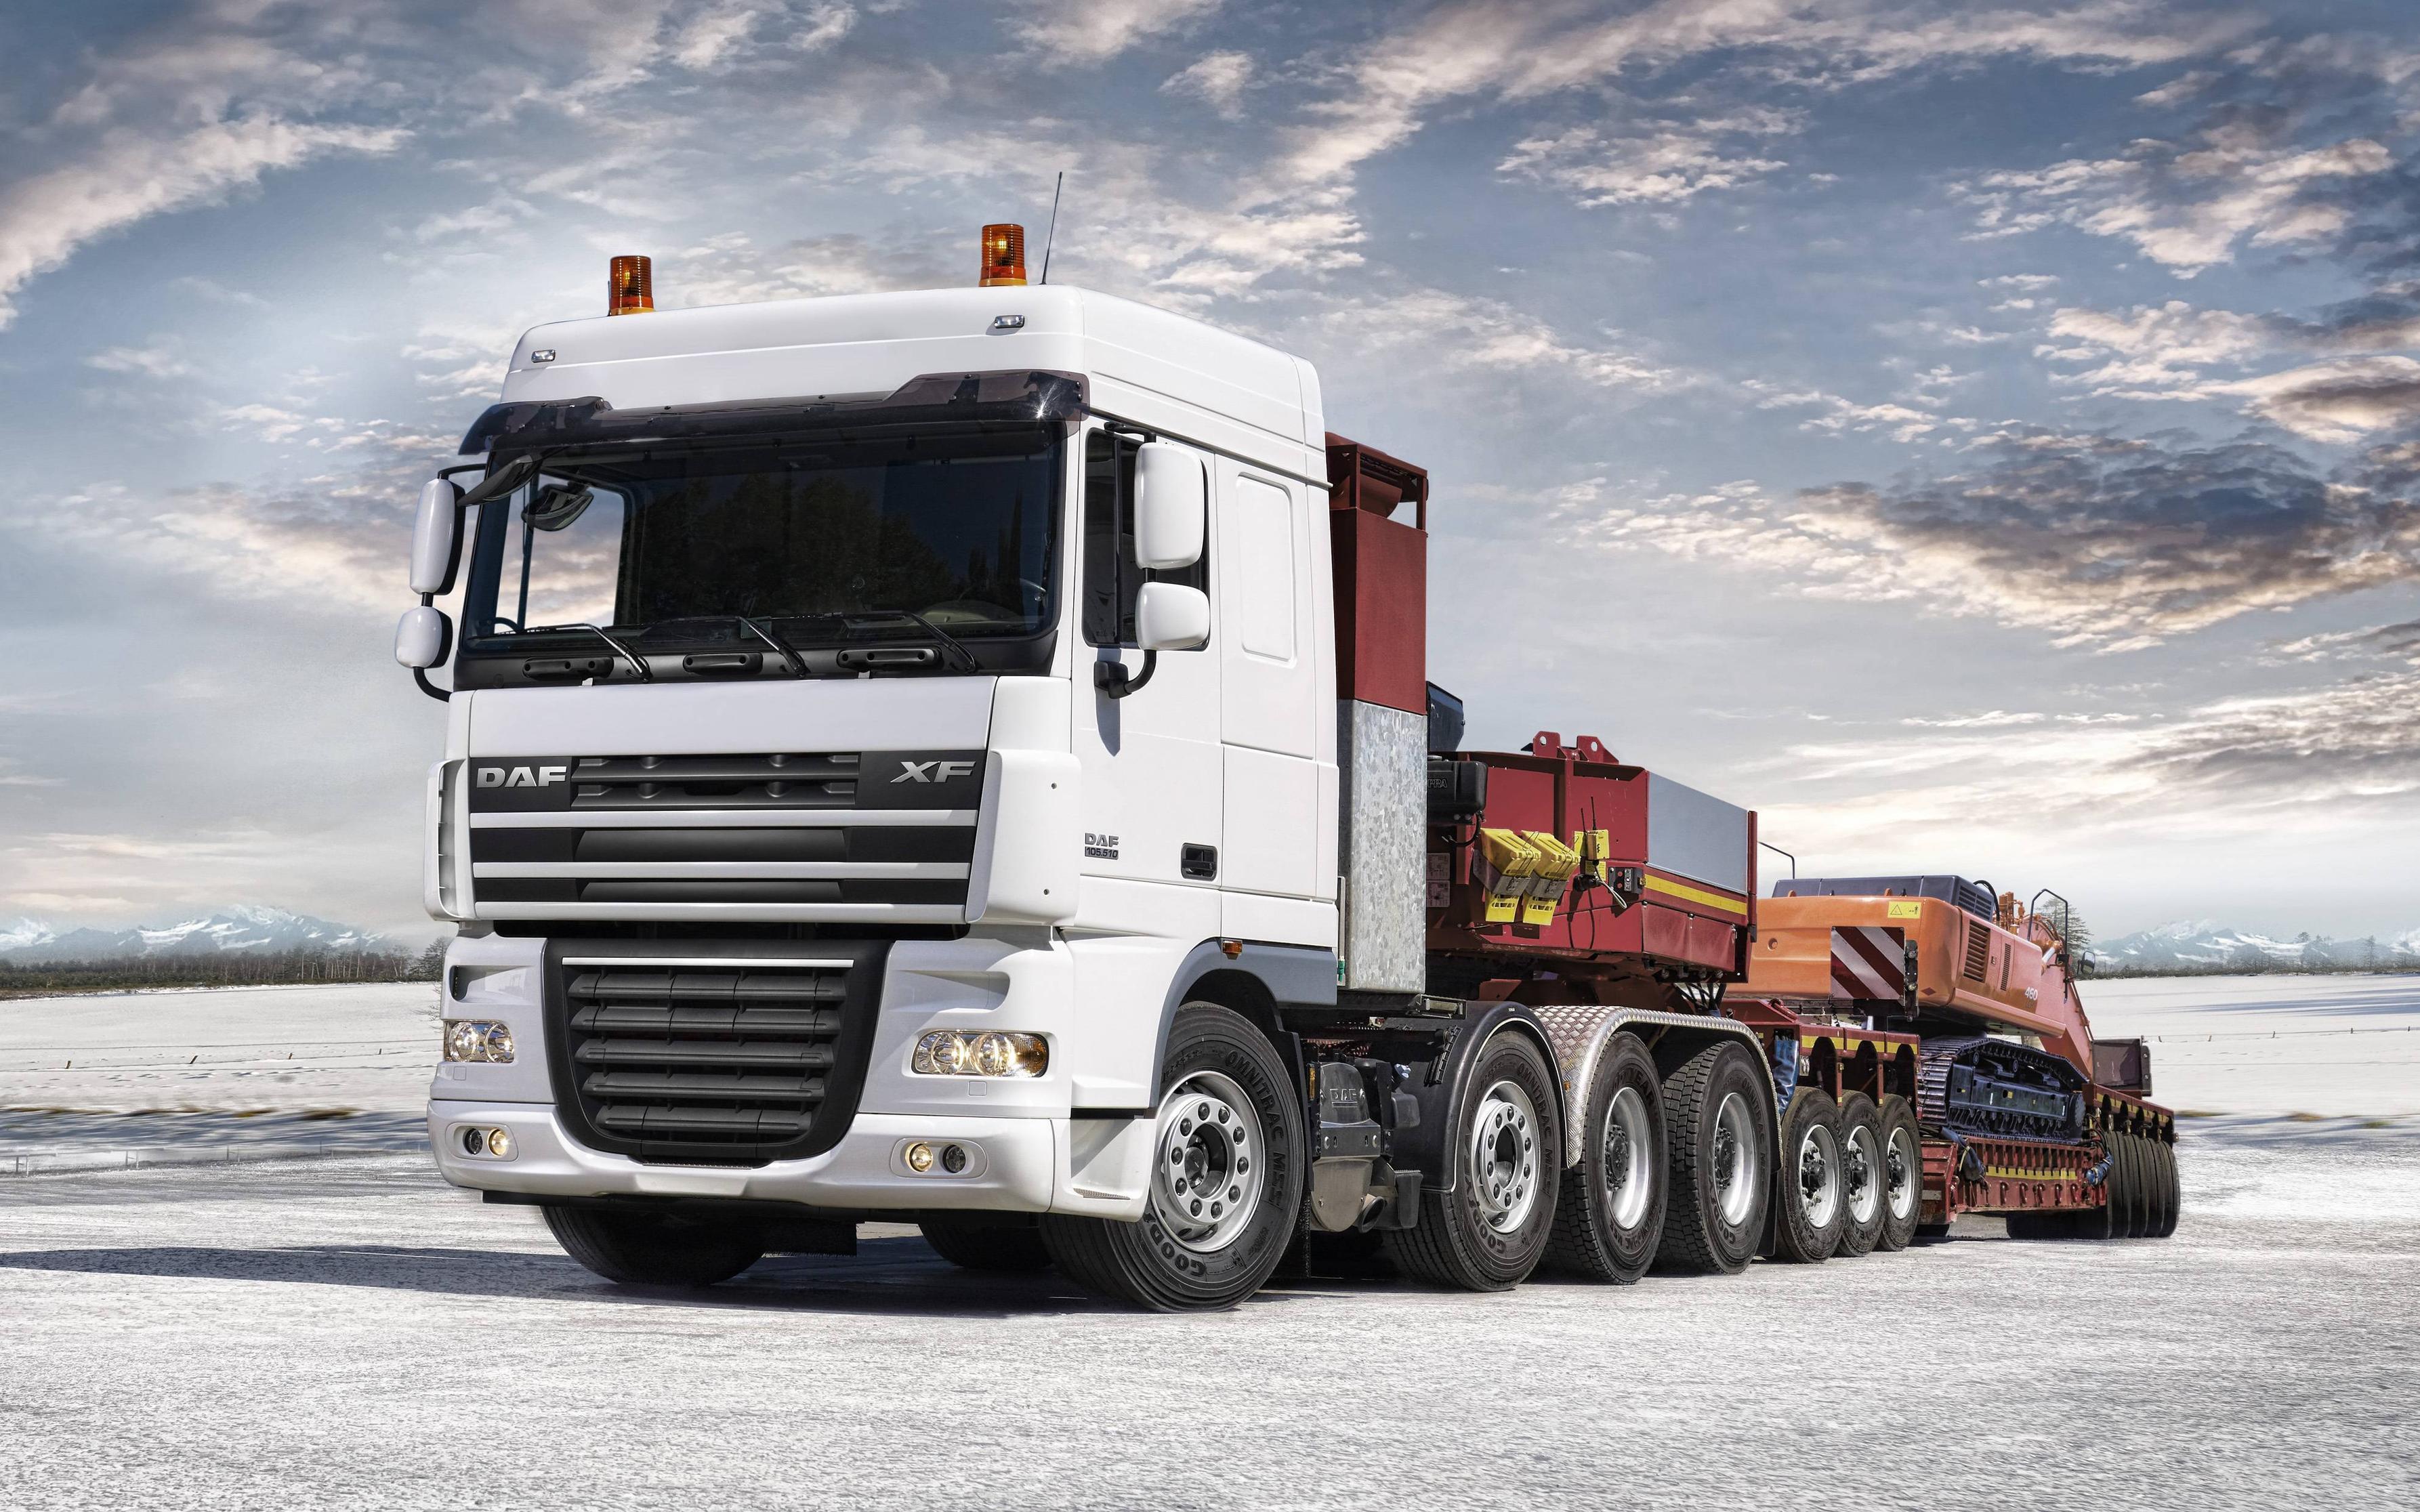 Trucks-wallpapers